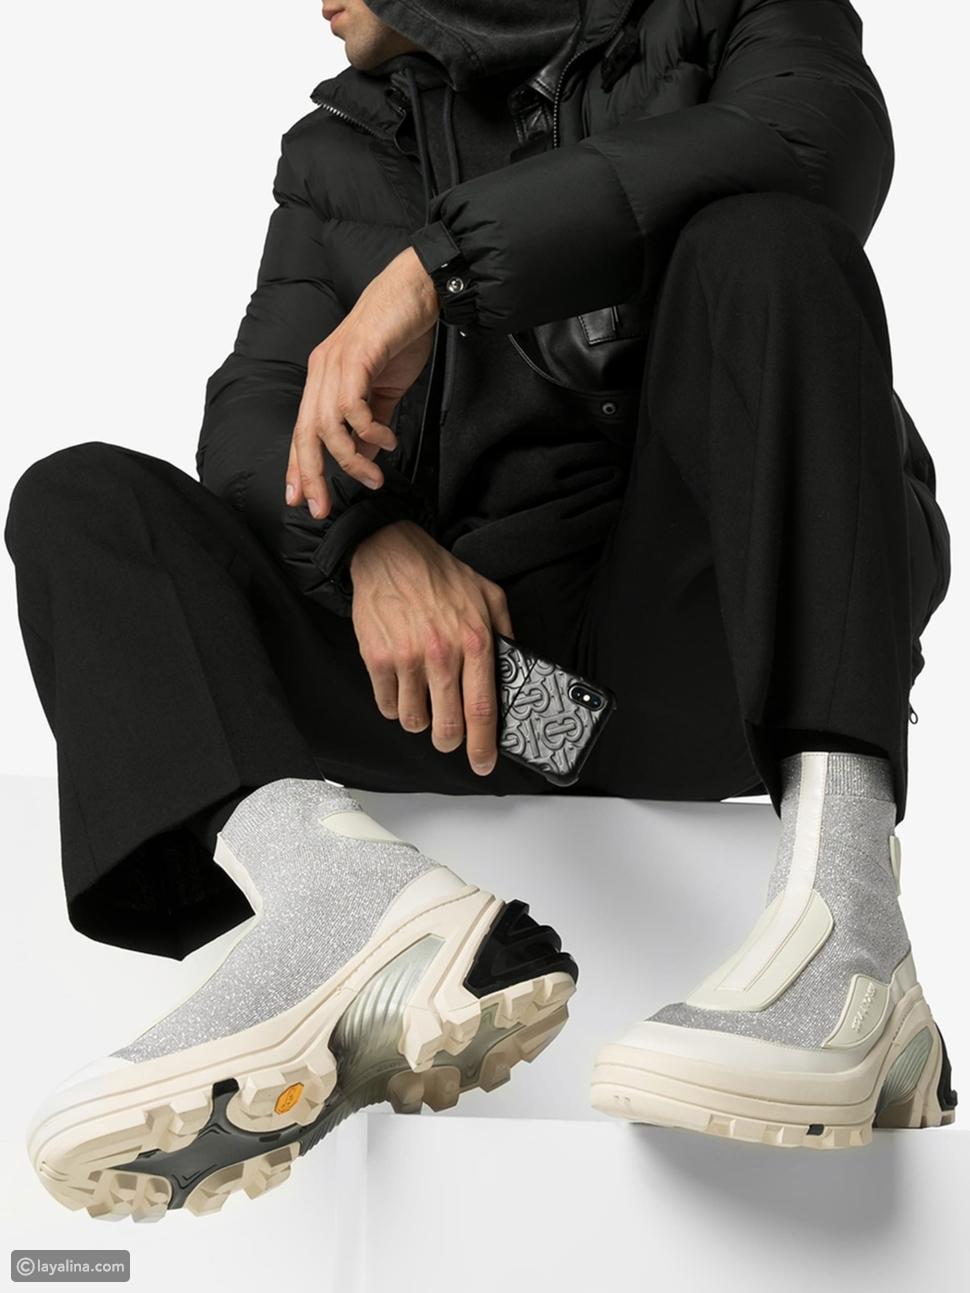 أبرز صيحات Sneakers لصيف 2020